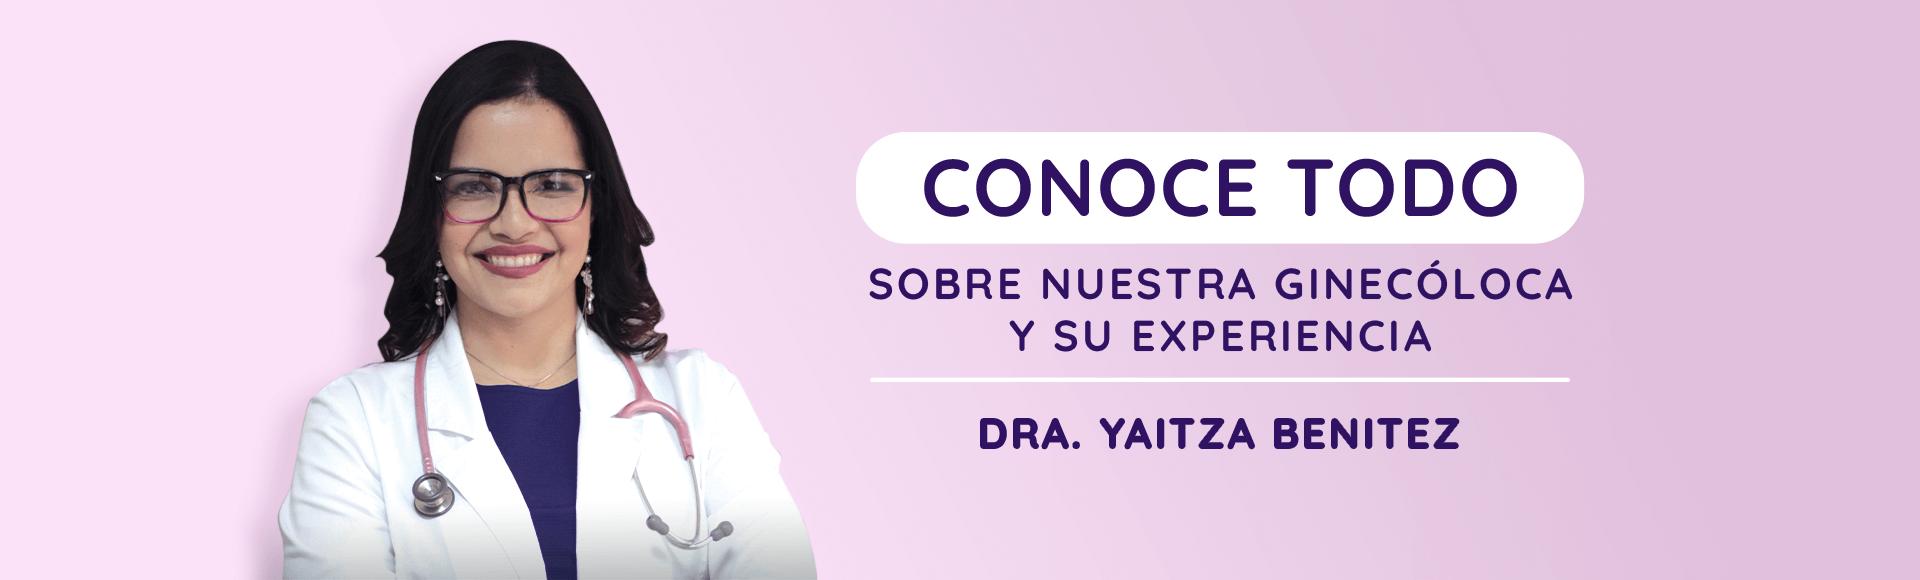 doctora ginecologa